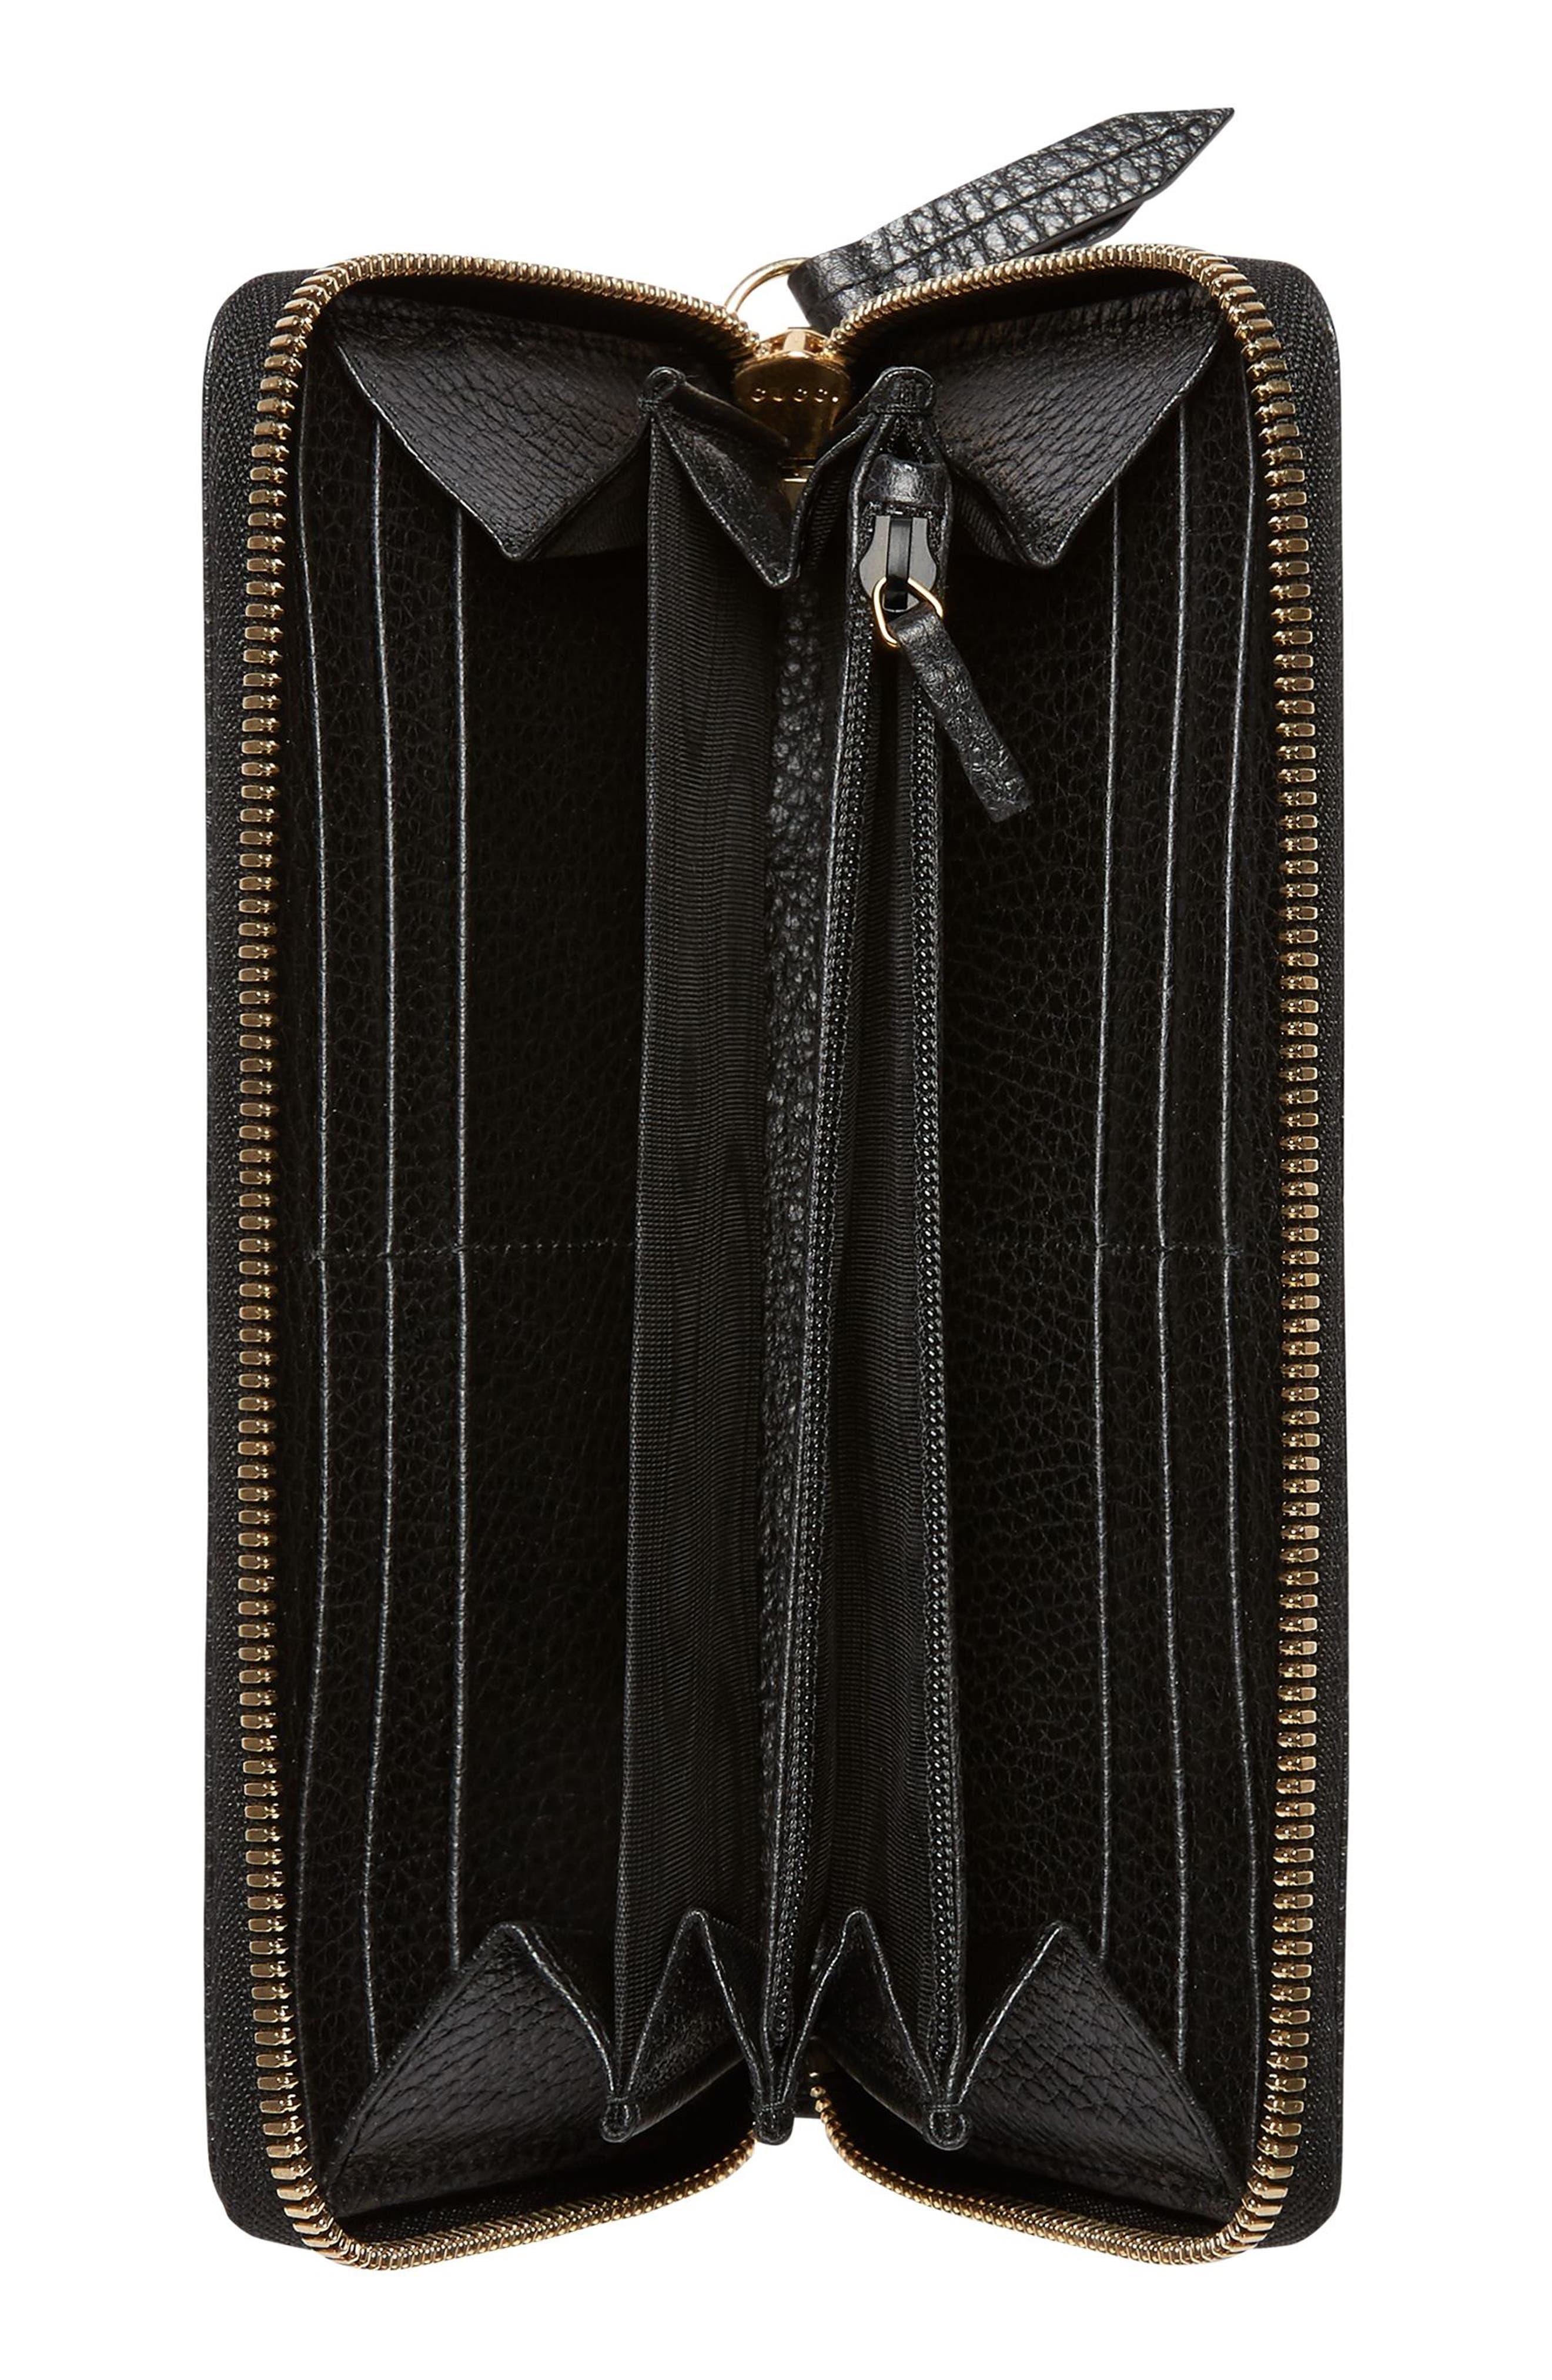 Petite Marmont Leather Zip Around Wallet,                             Alternate thumbnail 2, color,                             Nero/ Nero